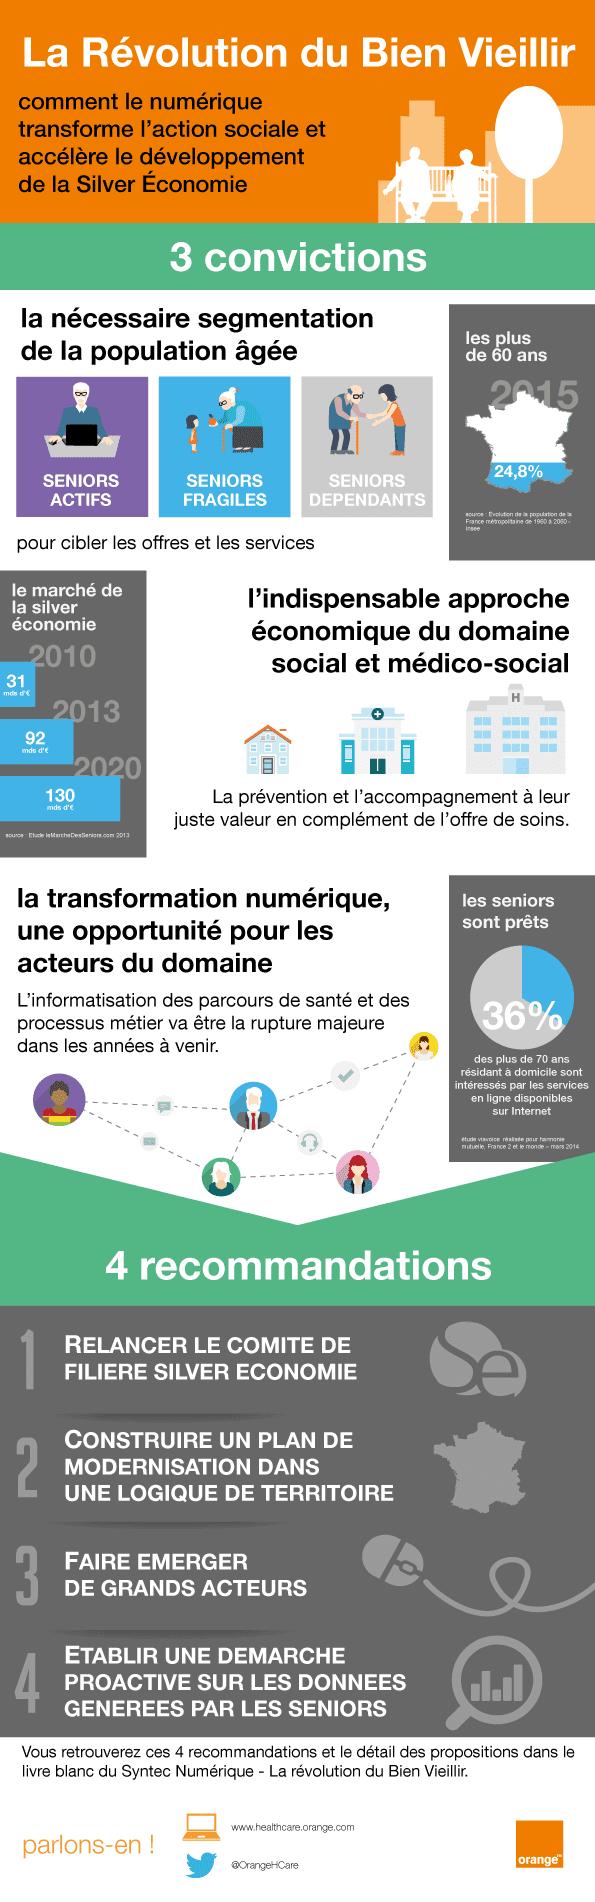 infographie-la-revolution-du-bien-vieillir-fr-orange